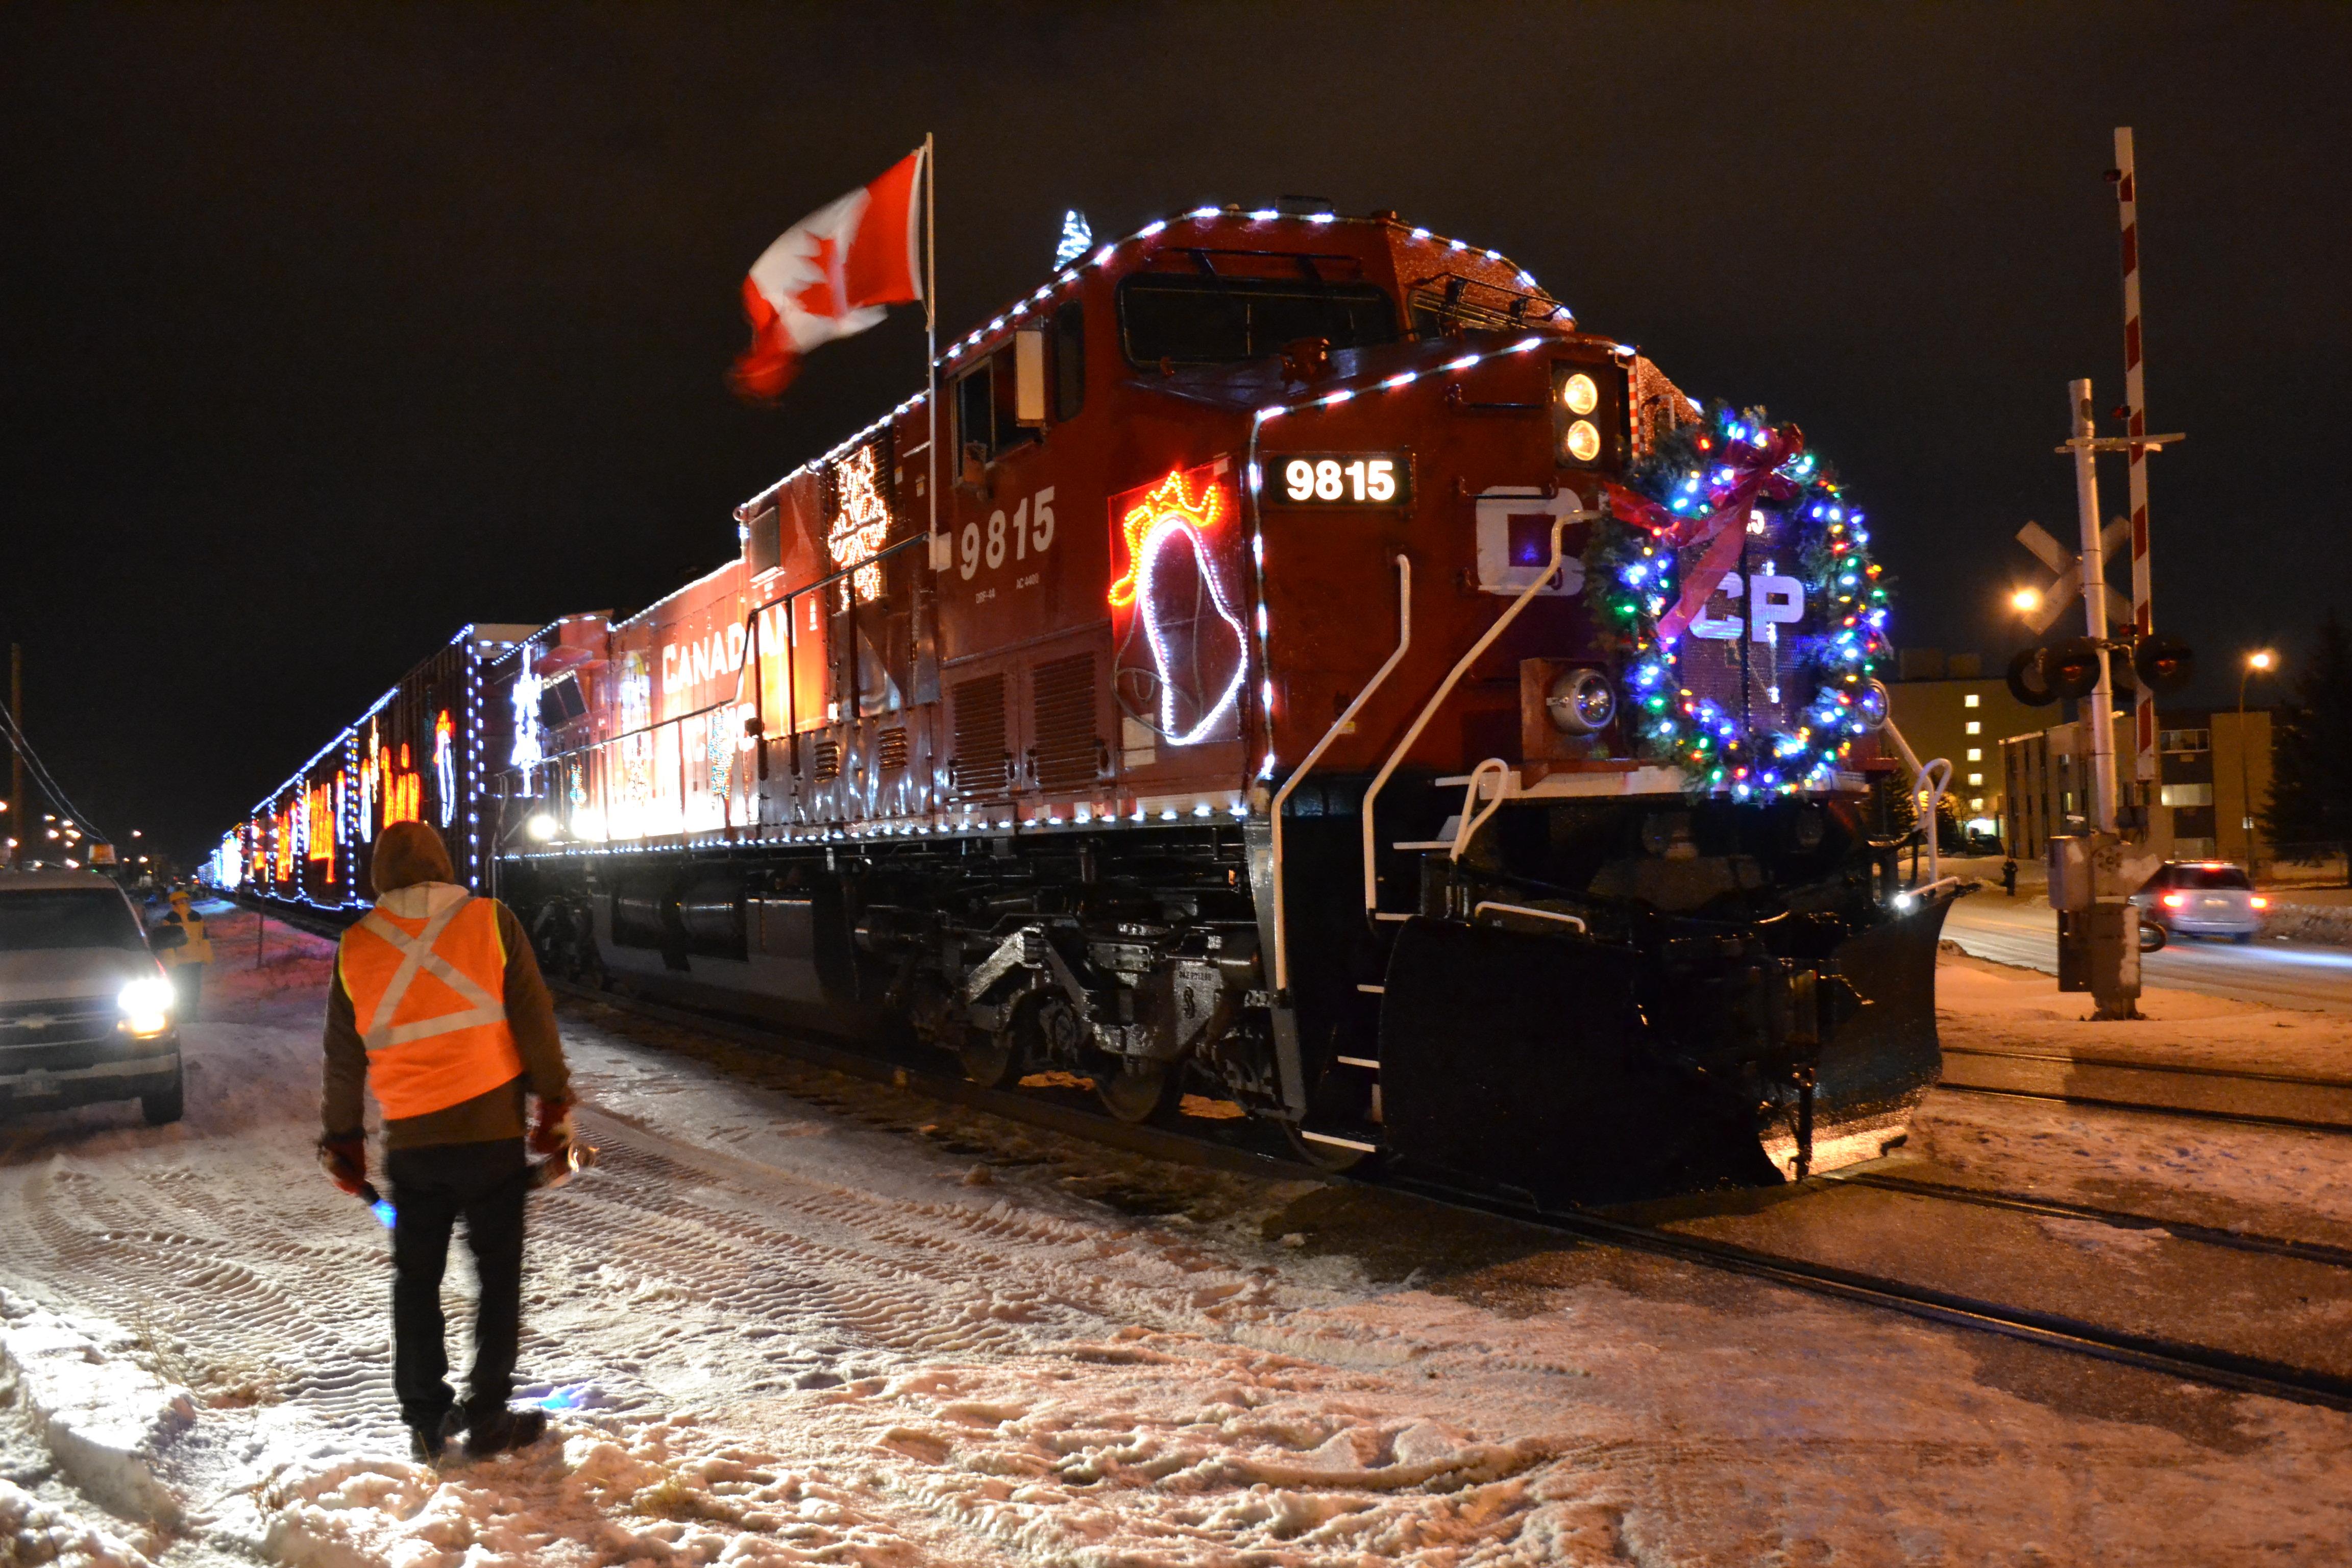 871 railroad trains